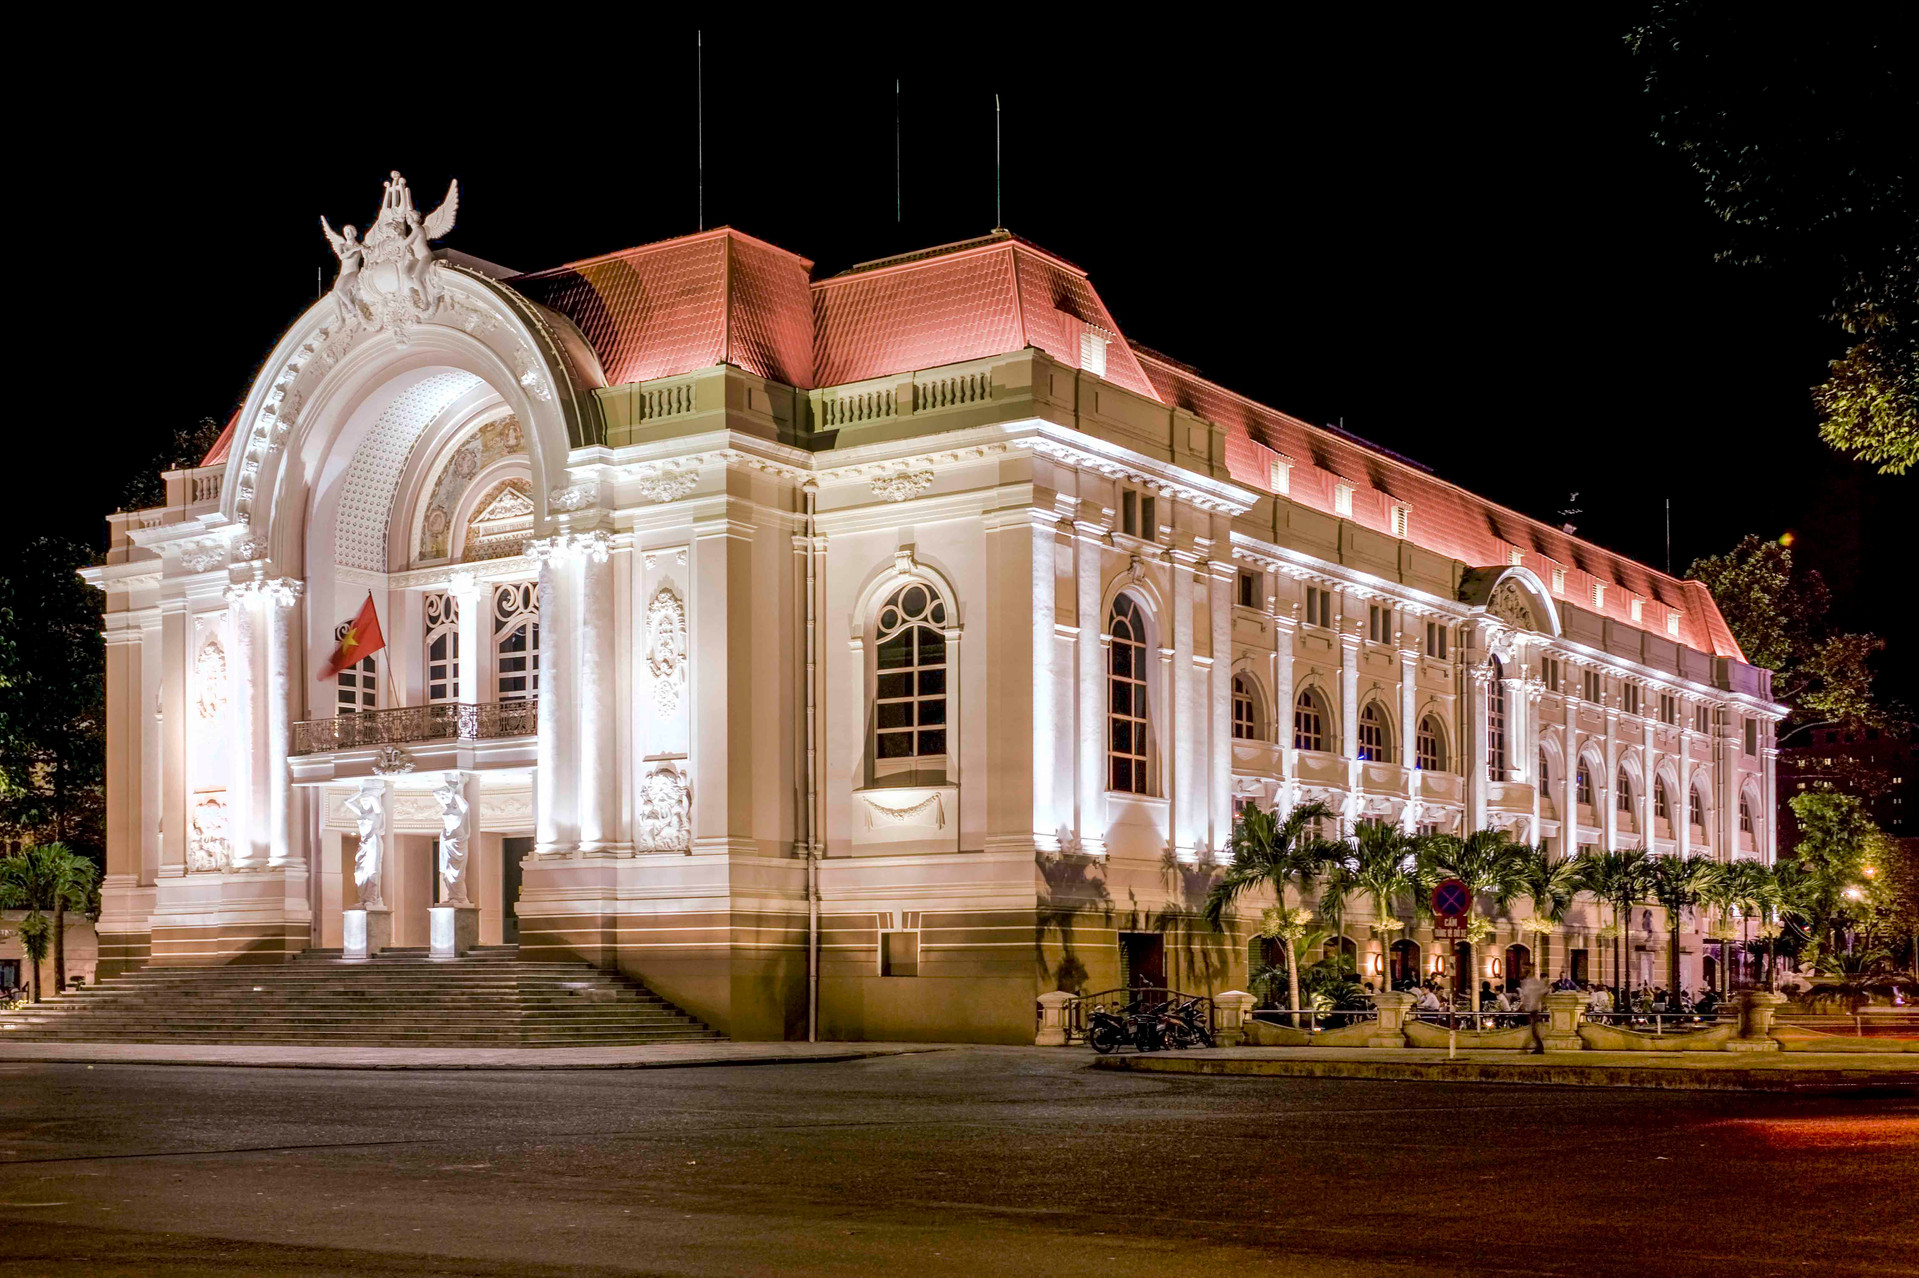 45 • Théâtre municipal - 0-Hô Chi Minh Ville